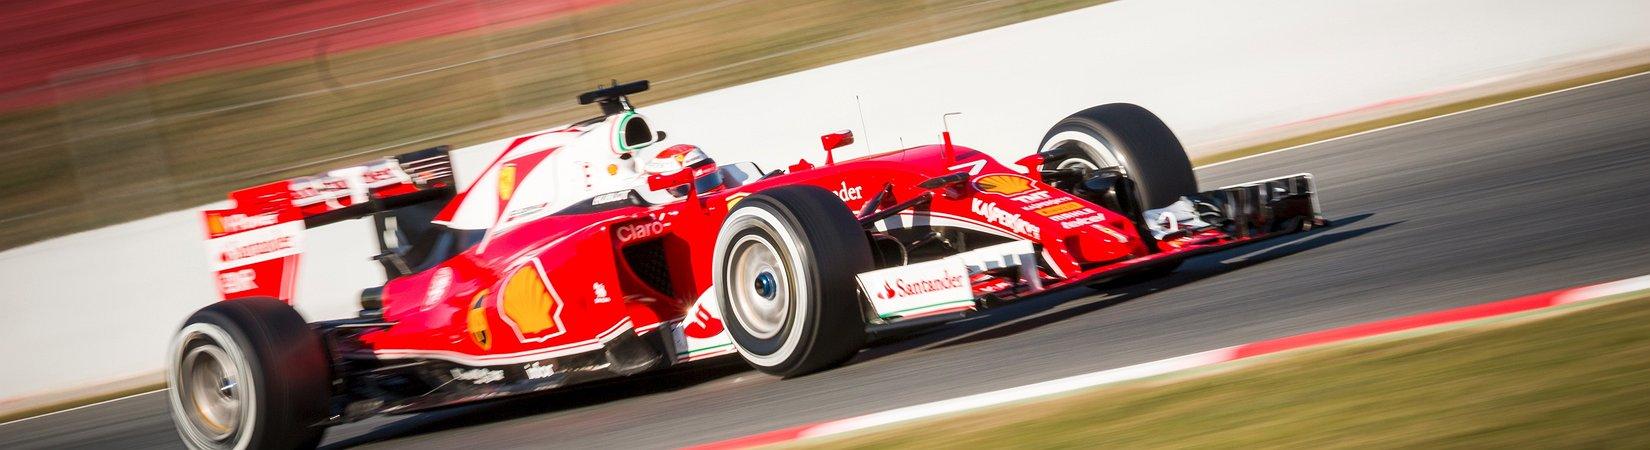 Ferrari im Stau